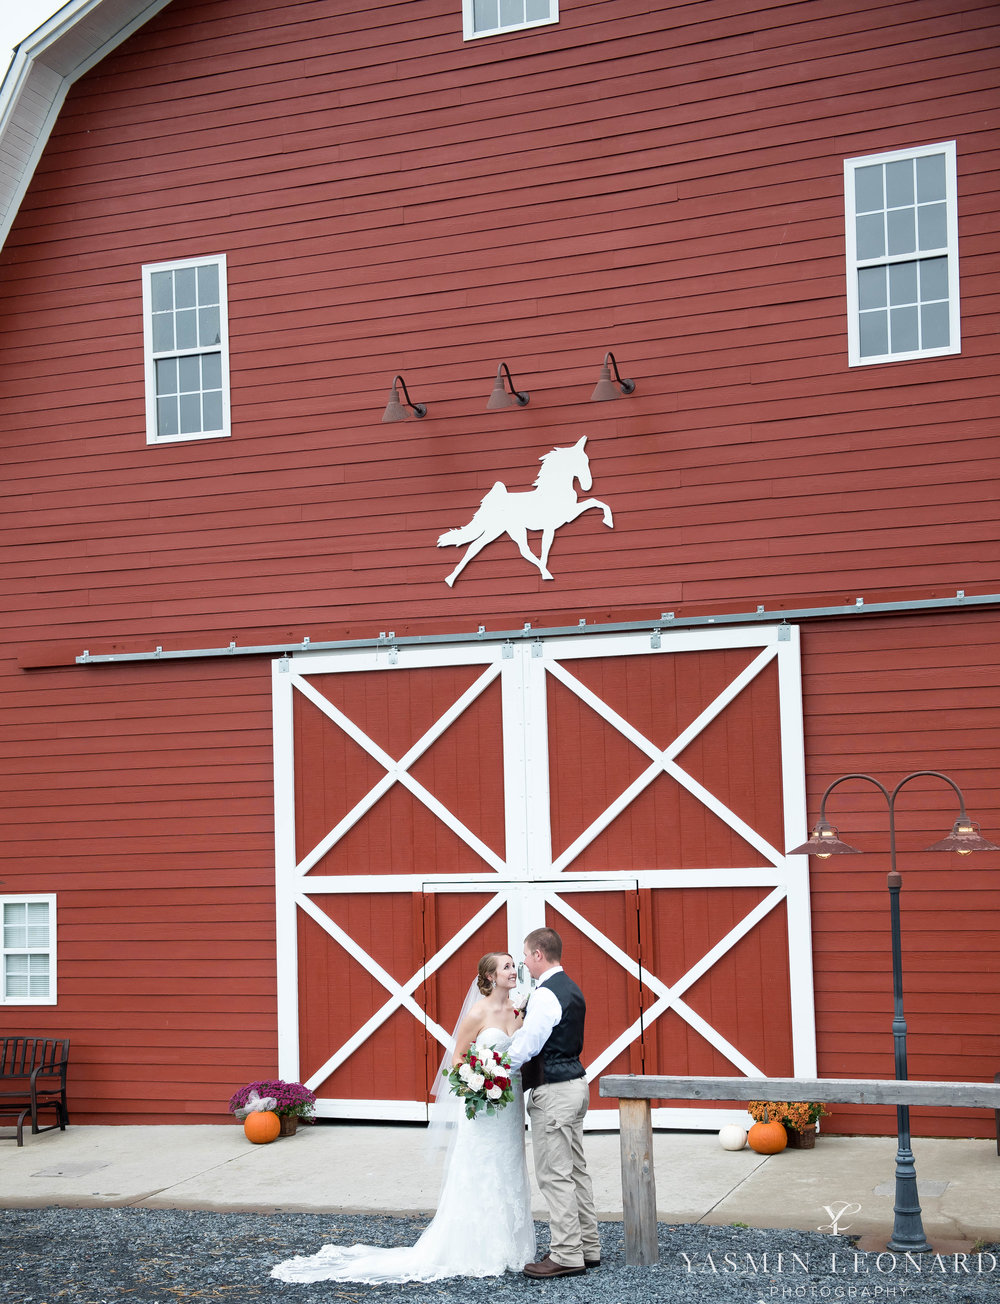 Millikan Farms - NC Wedding Venue - NC Wedding Photographer - Yasmin Leonard Photography - Rain on your wedding day-39.jpg